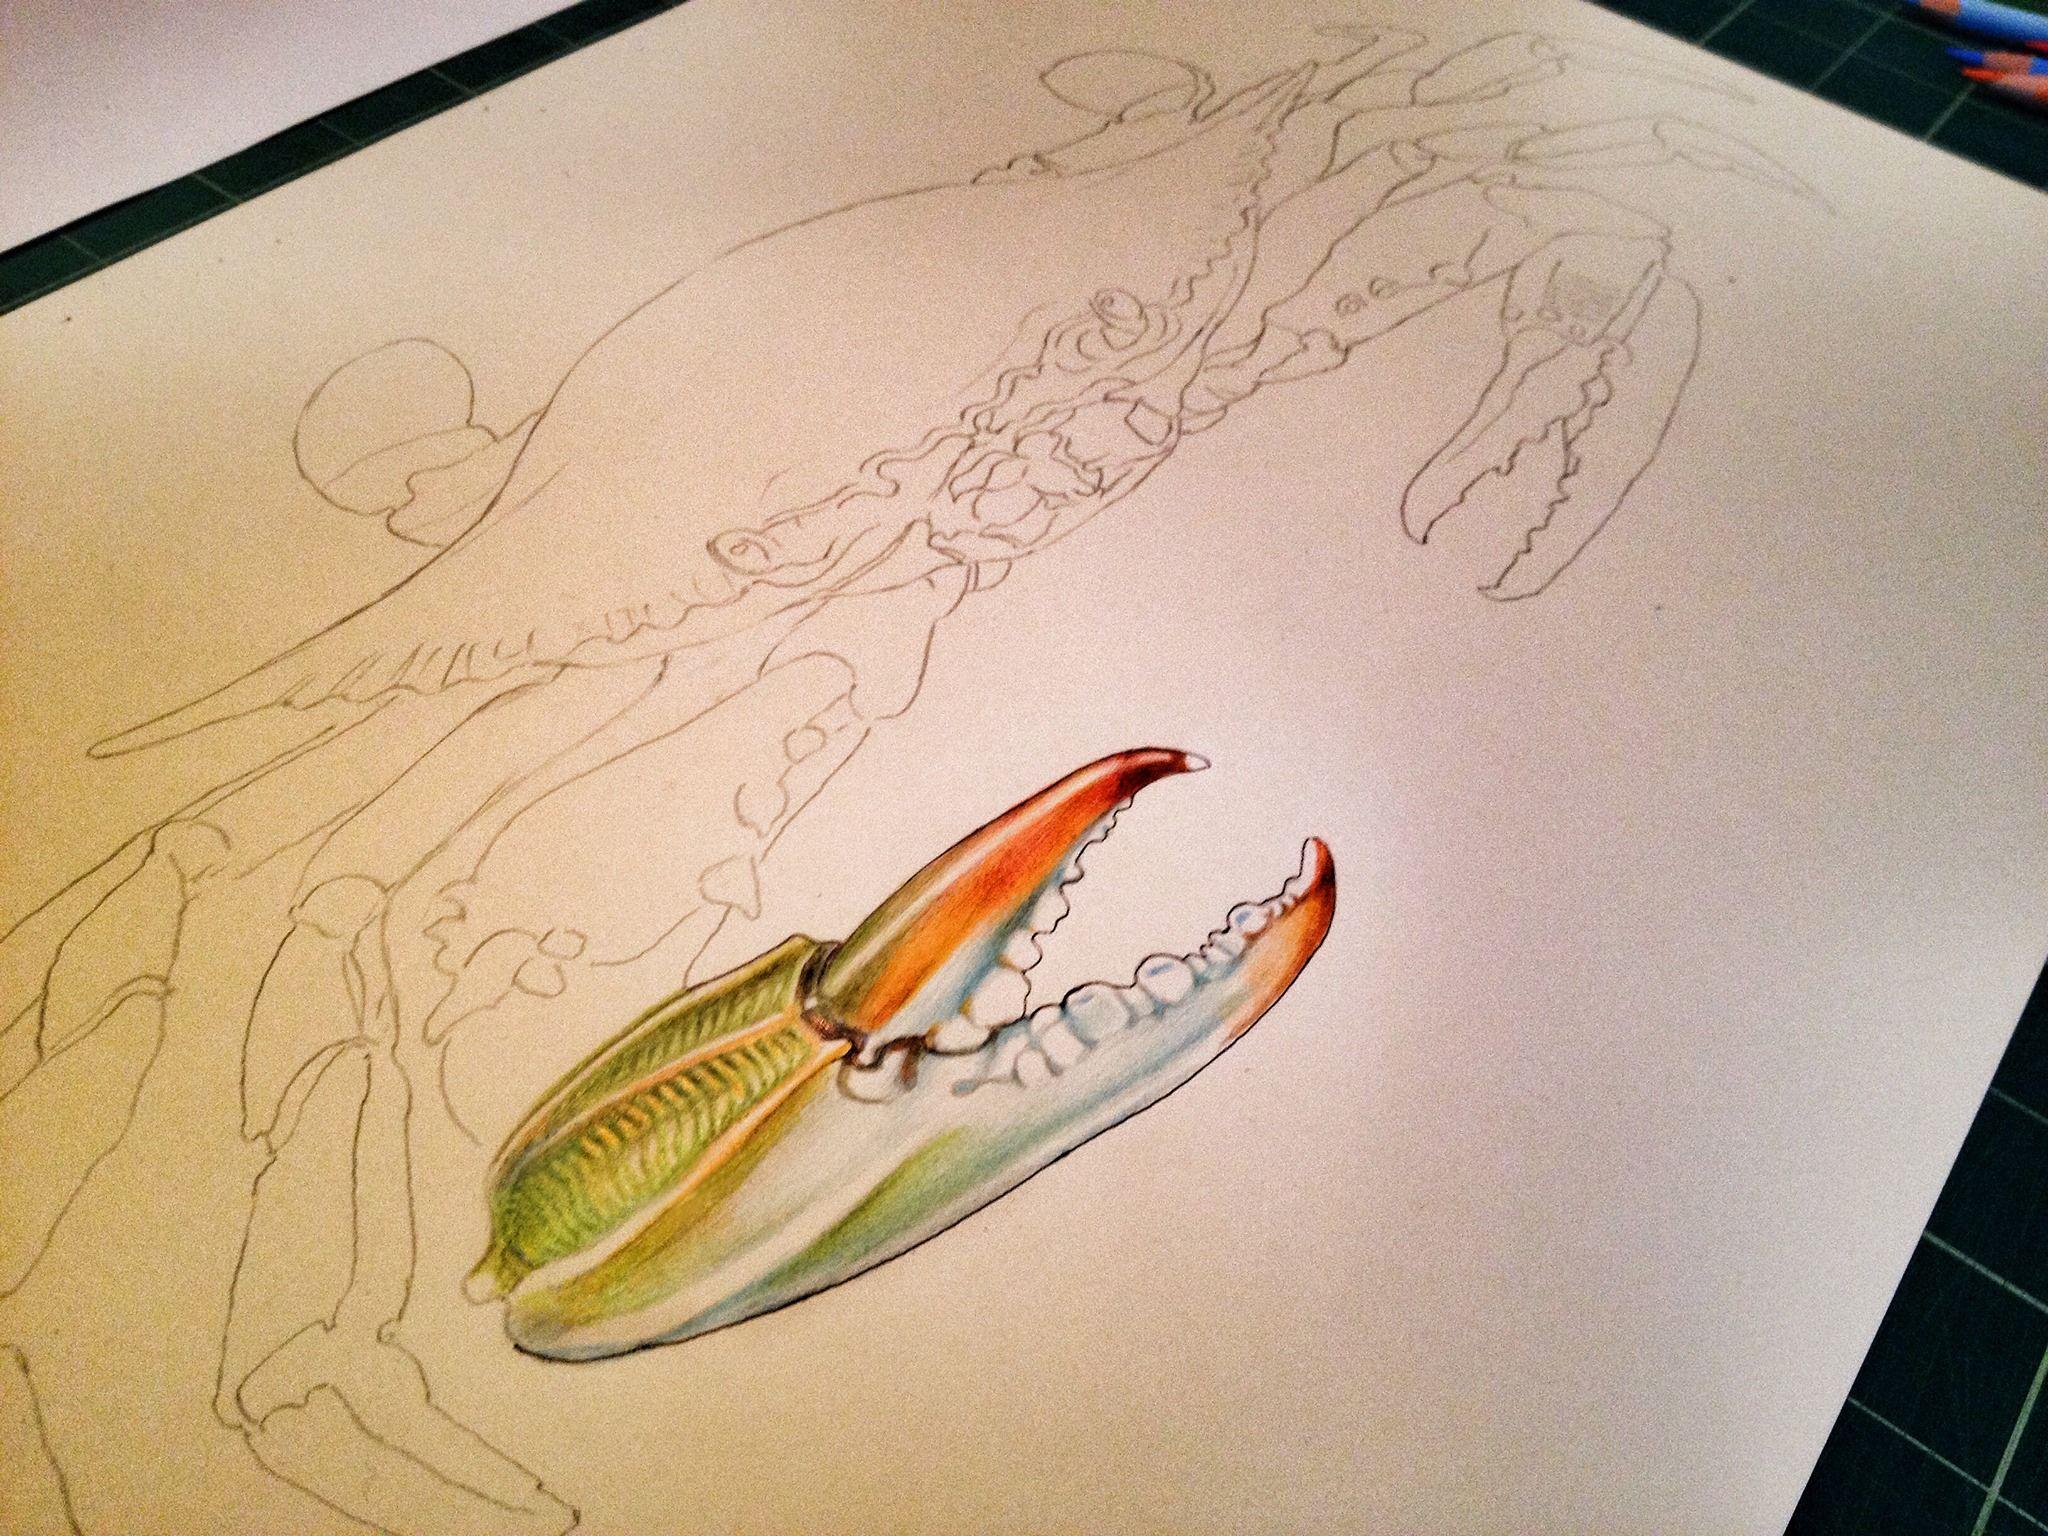 Pin de Mary Lanclos en colored pencil techniques | Pinterest